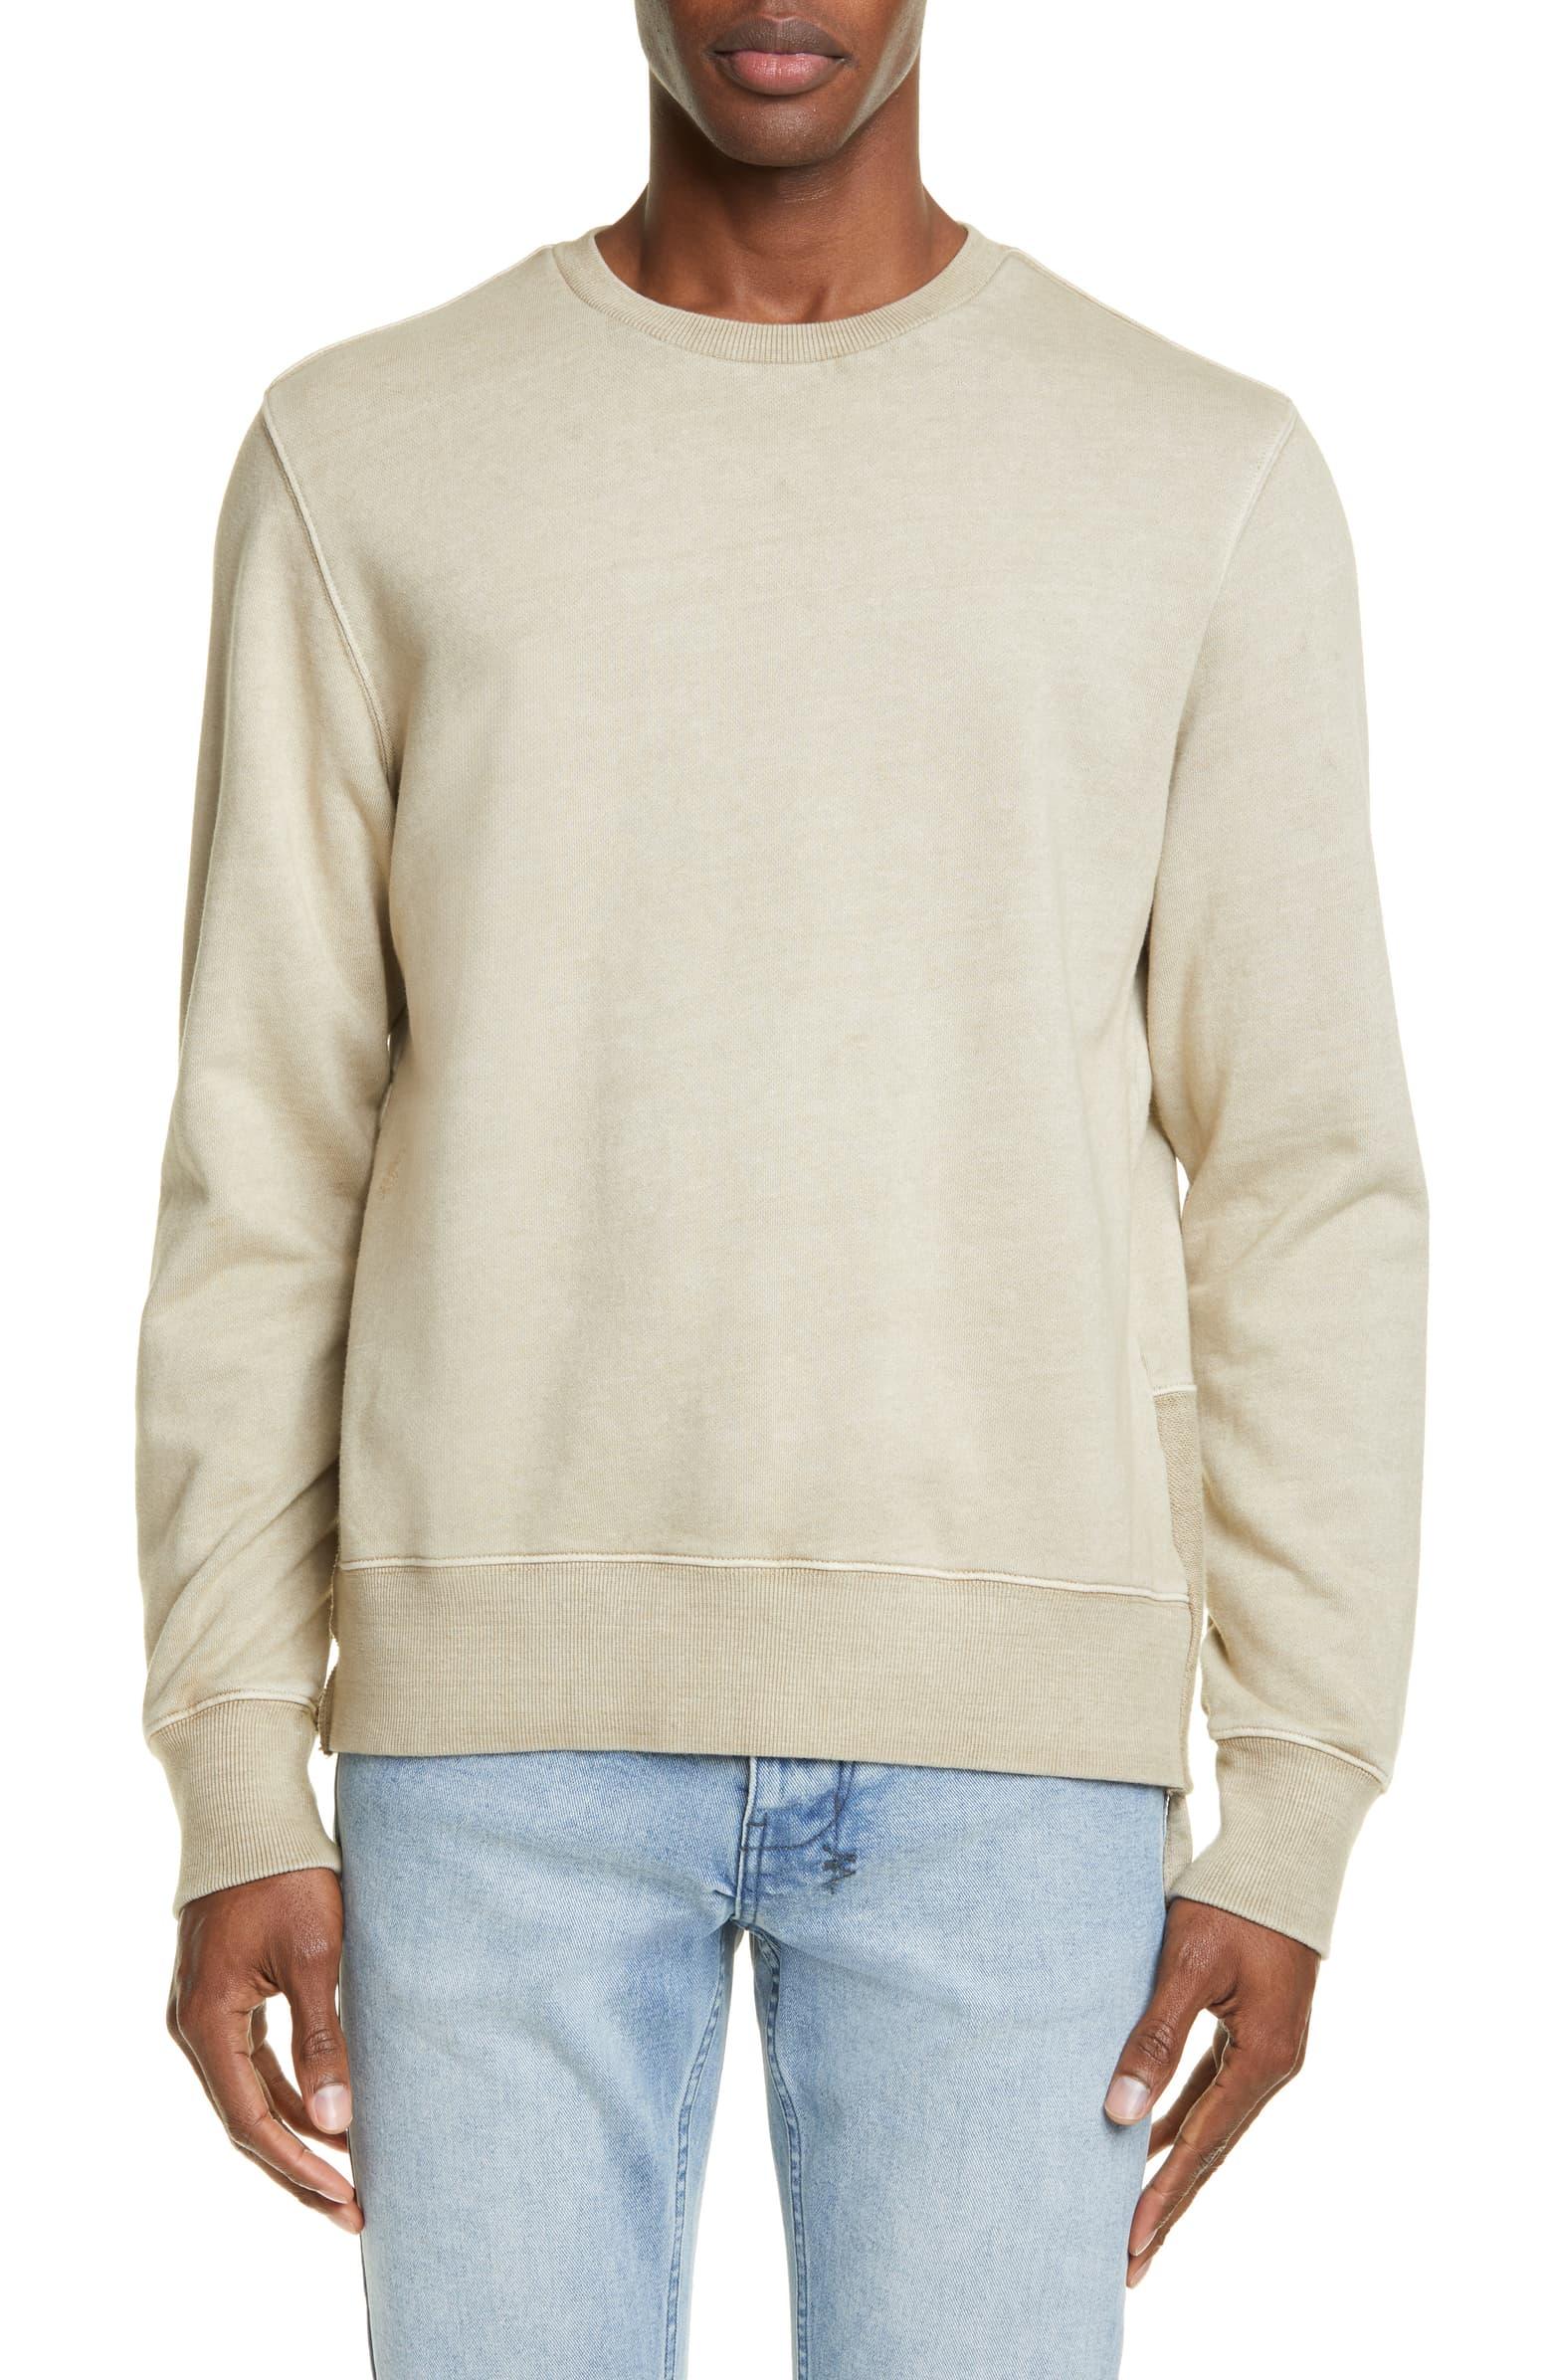 KSUBI Seeing Lines Crewneck Sweatshirt